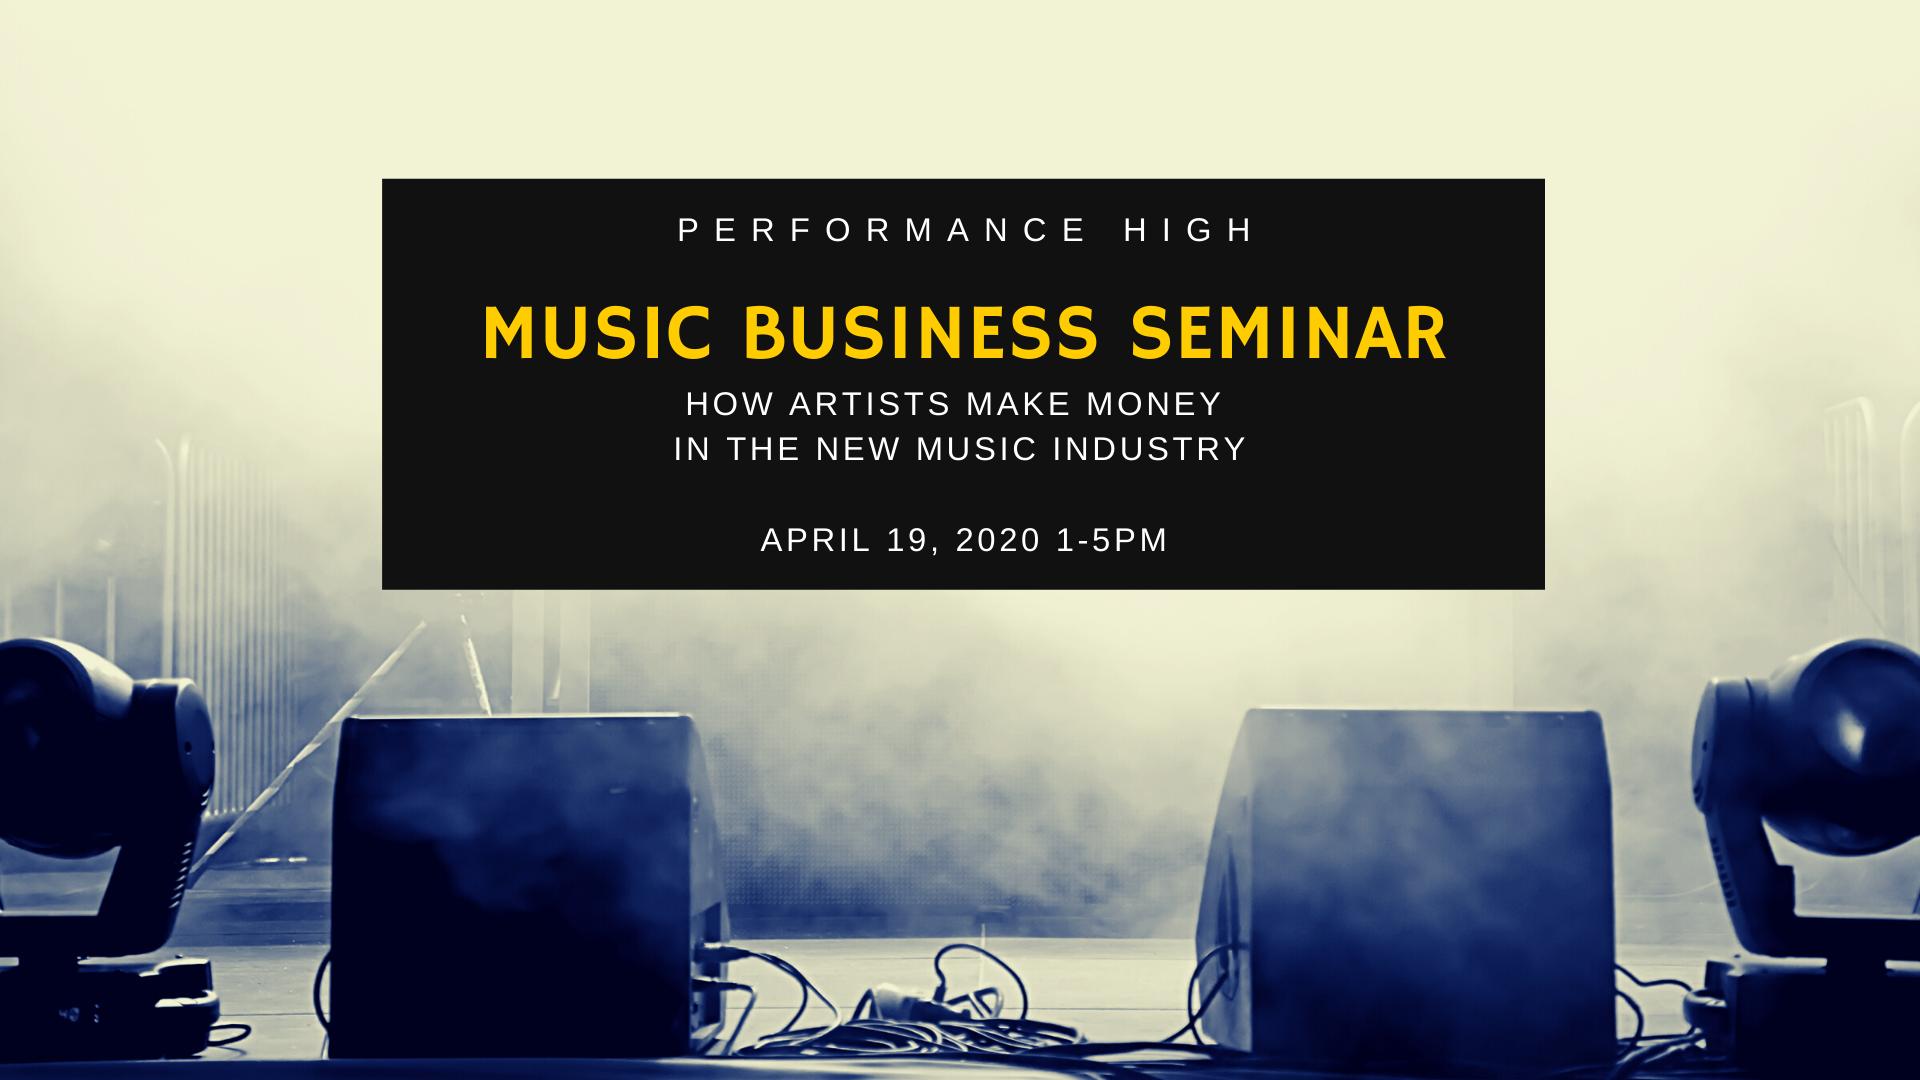 Music Business Seminar